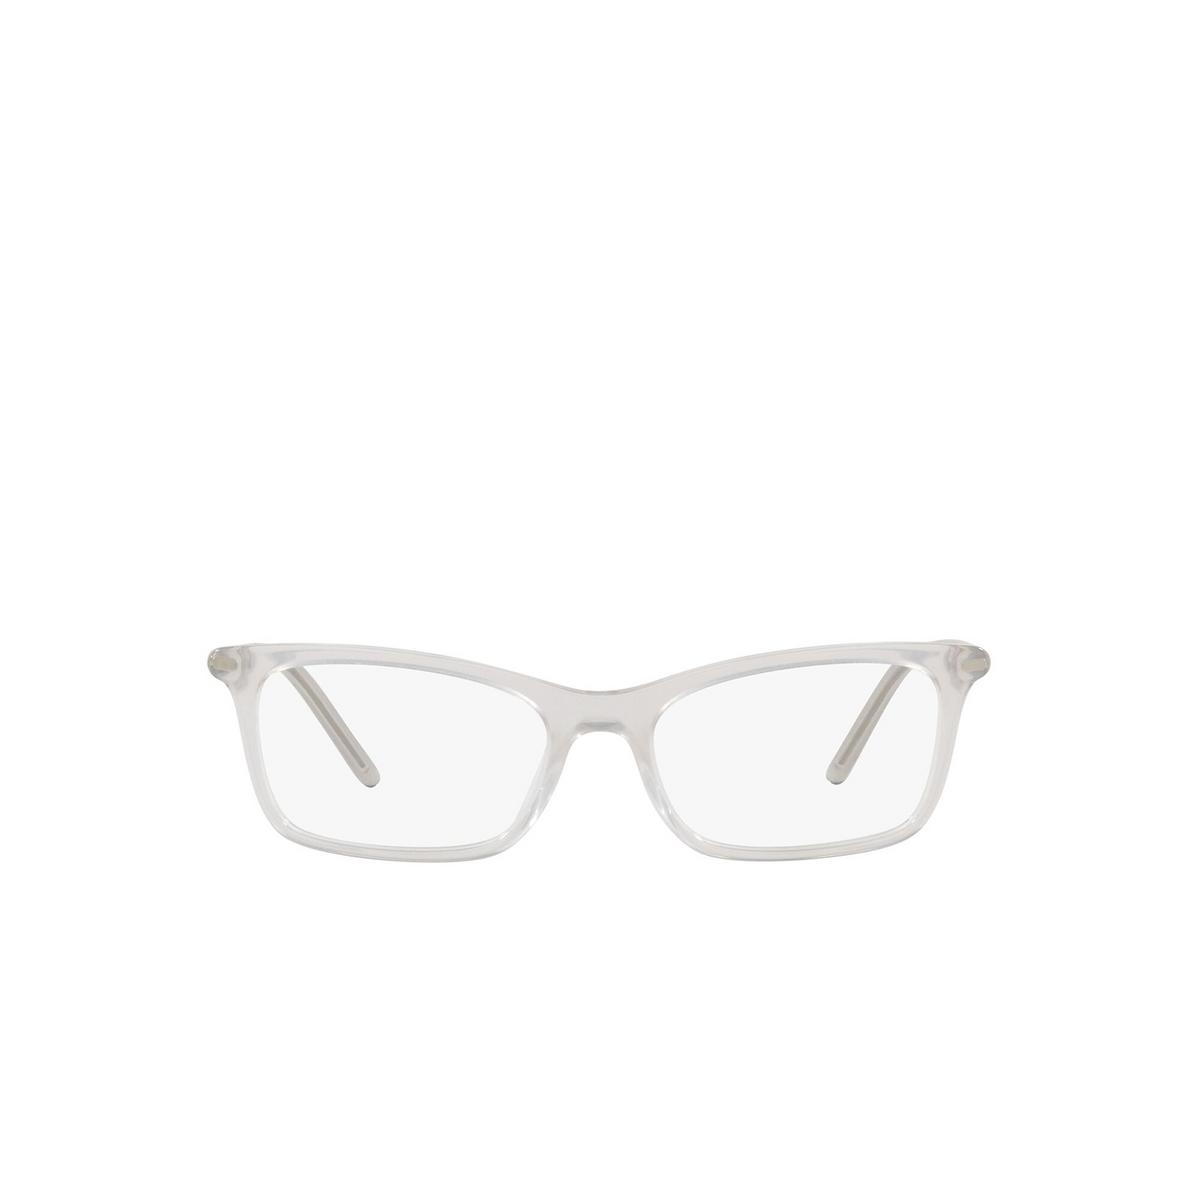 Prada® Rectangle Eyeglasses: PR 16WV color Opal Grey TWH1O1 - front view.